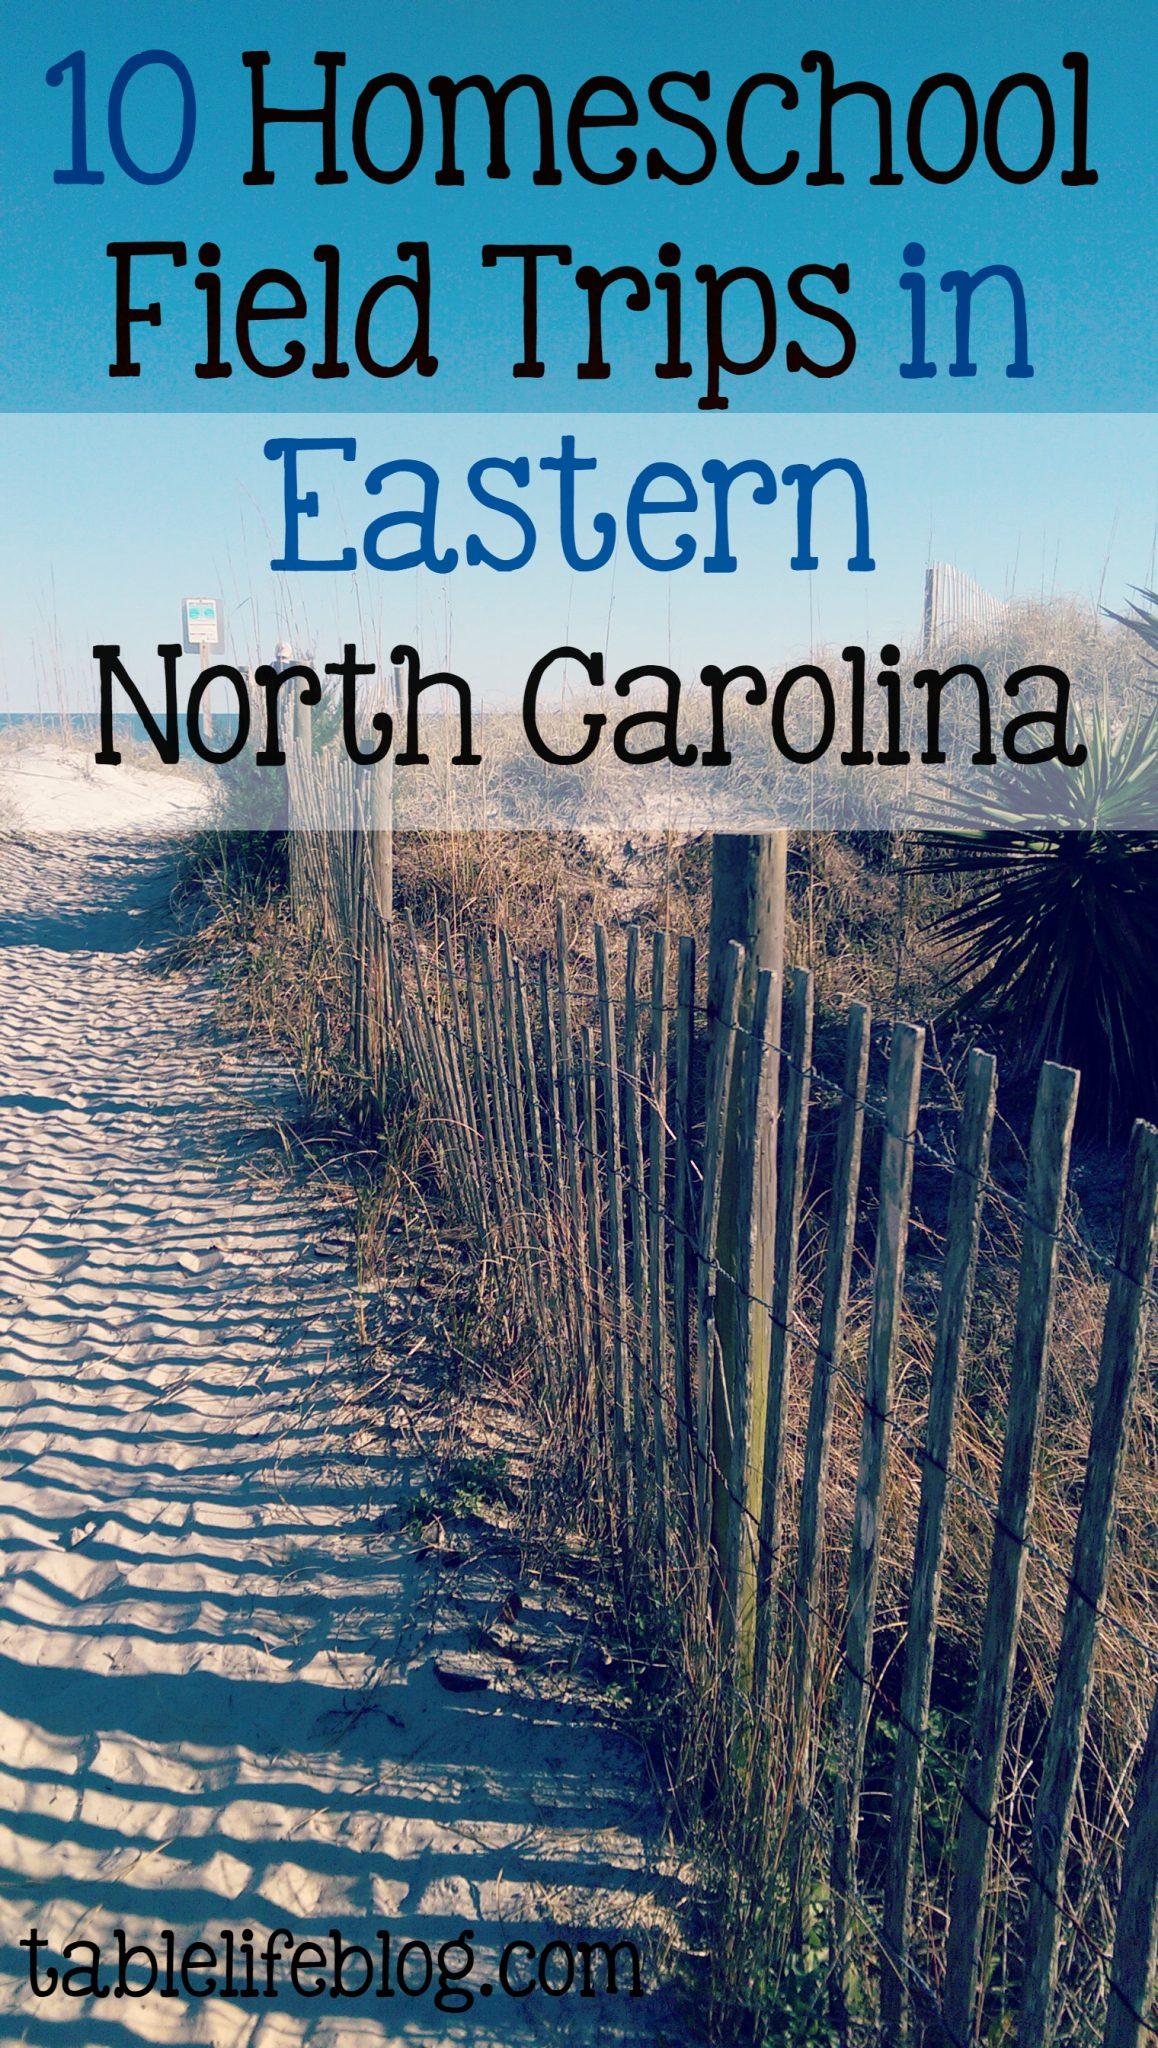 10 Homeschool Field Trips in Eastern North Carolina ...